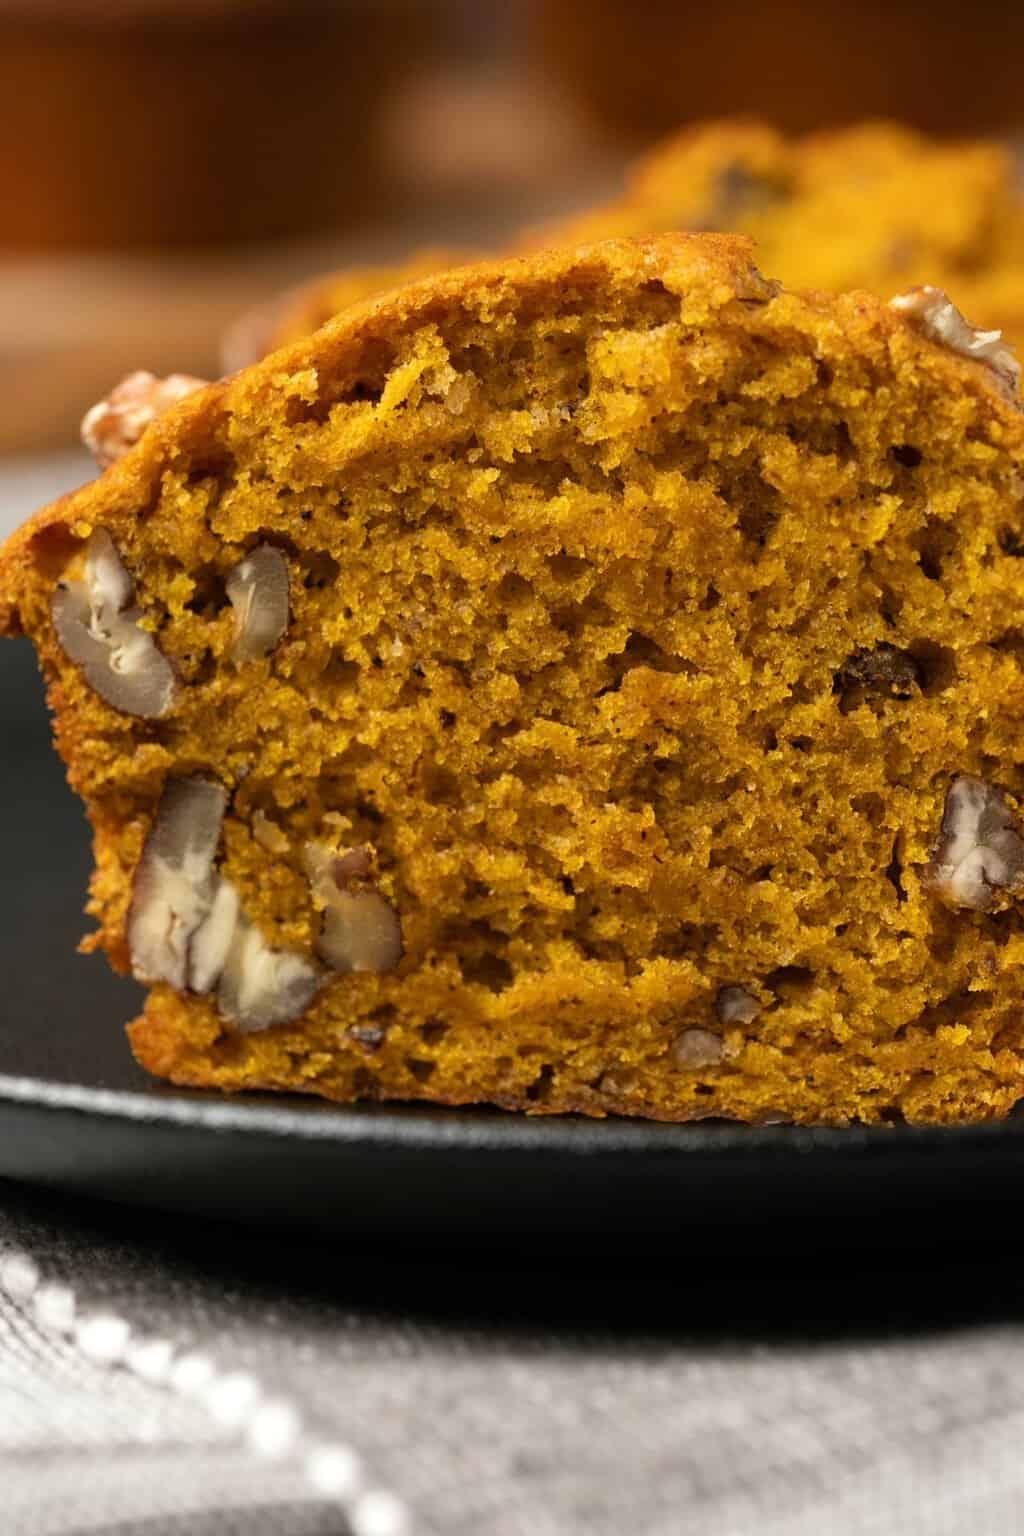 Vegan pumpkin muffin sliced in half on a plate.